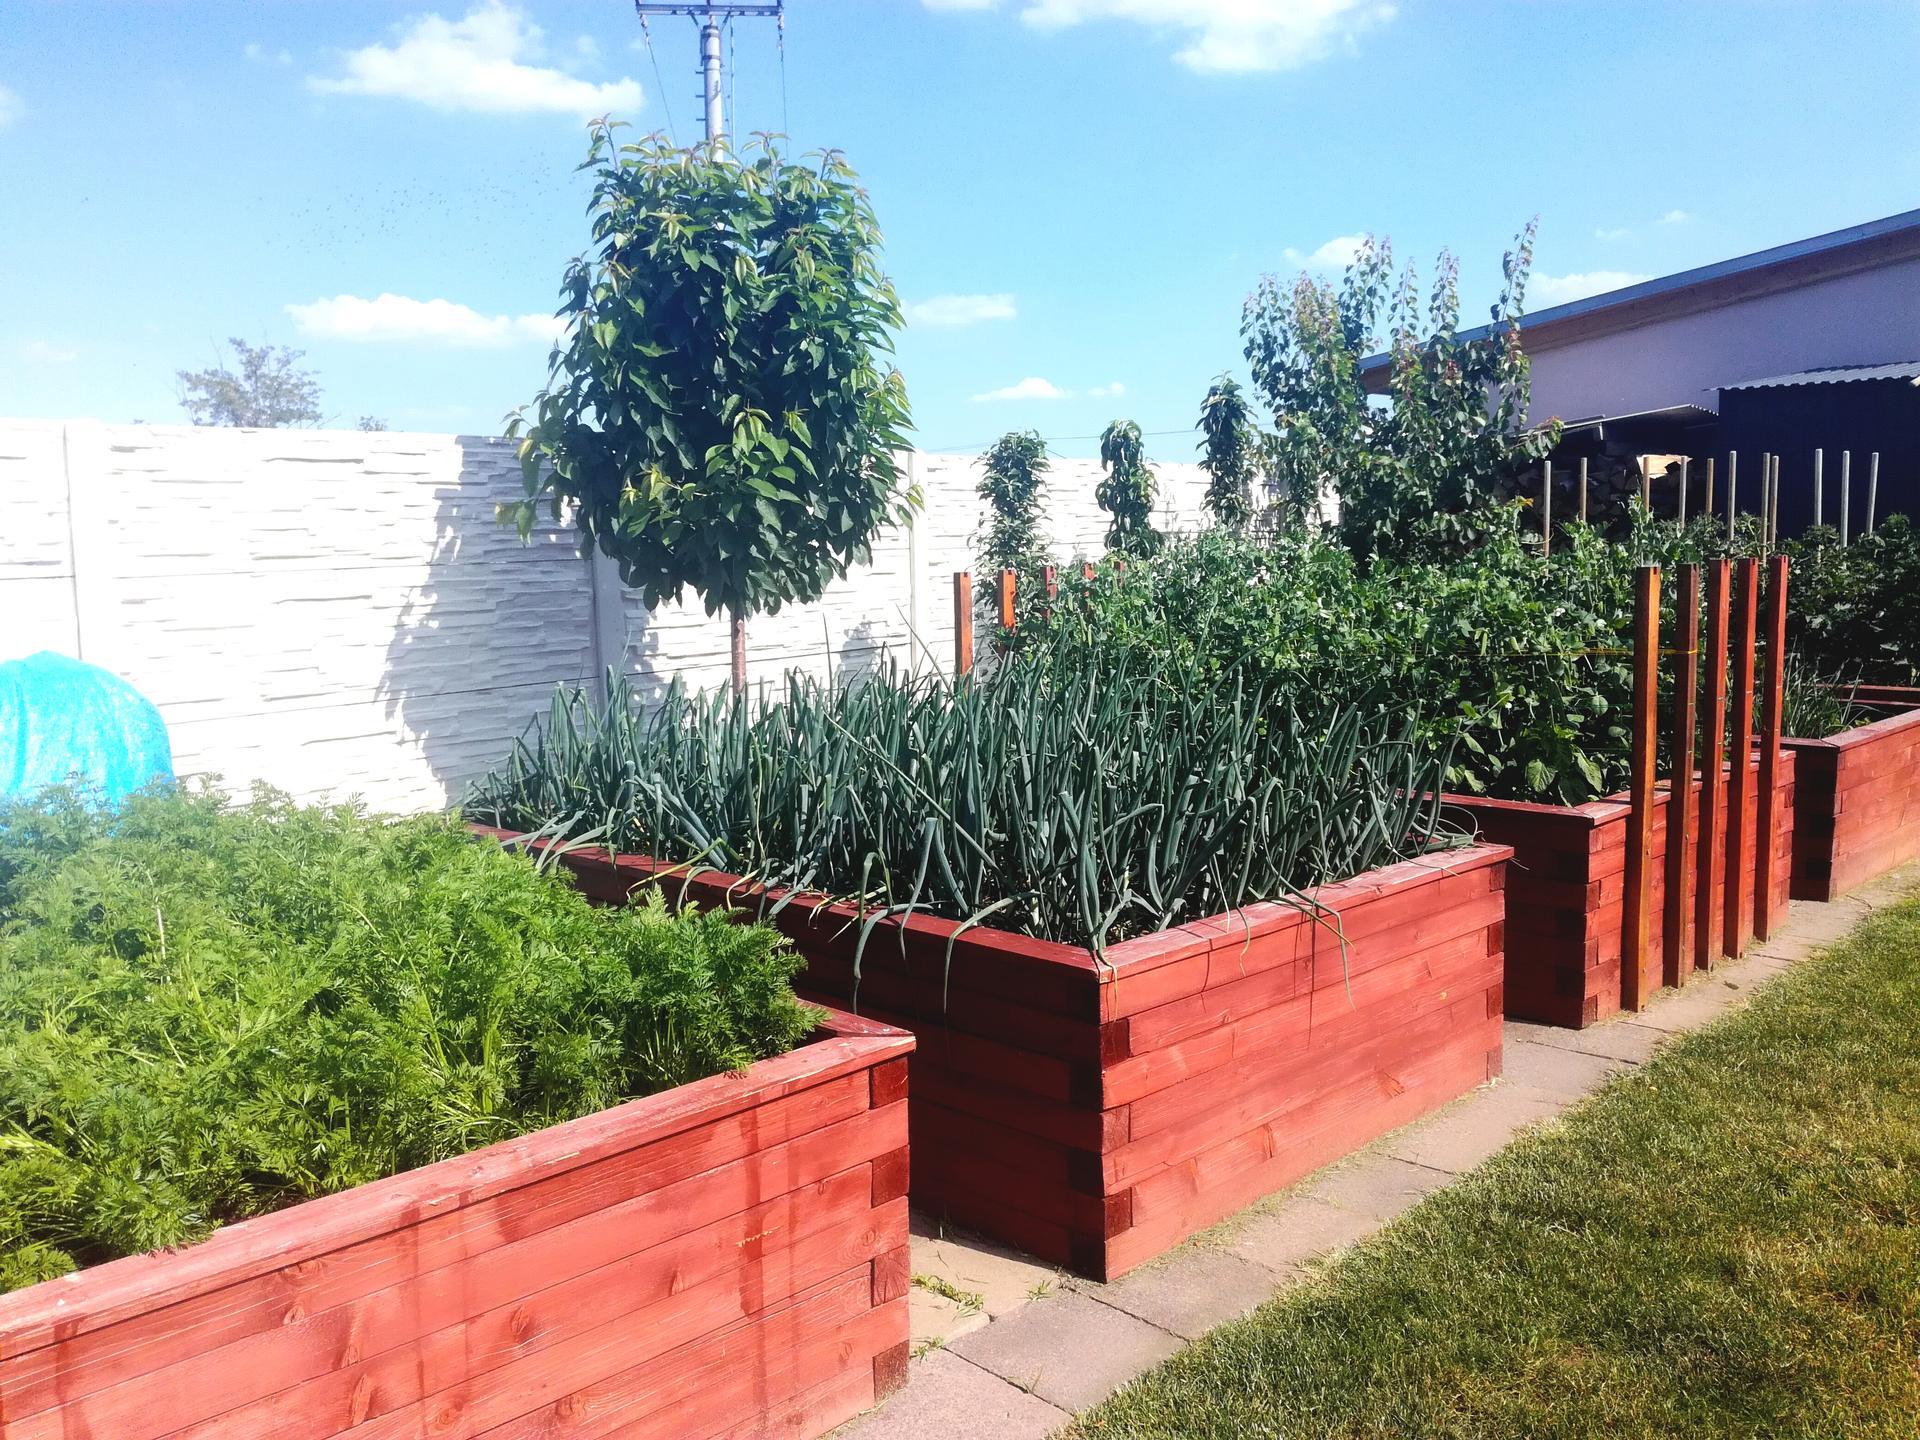 Zahrada 2021 🌲 - Obrázek č. 139